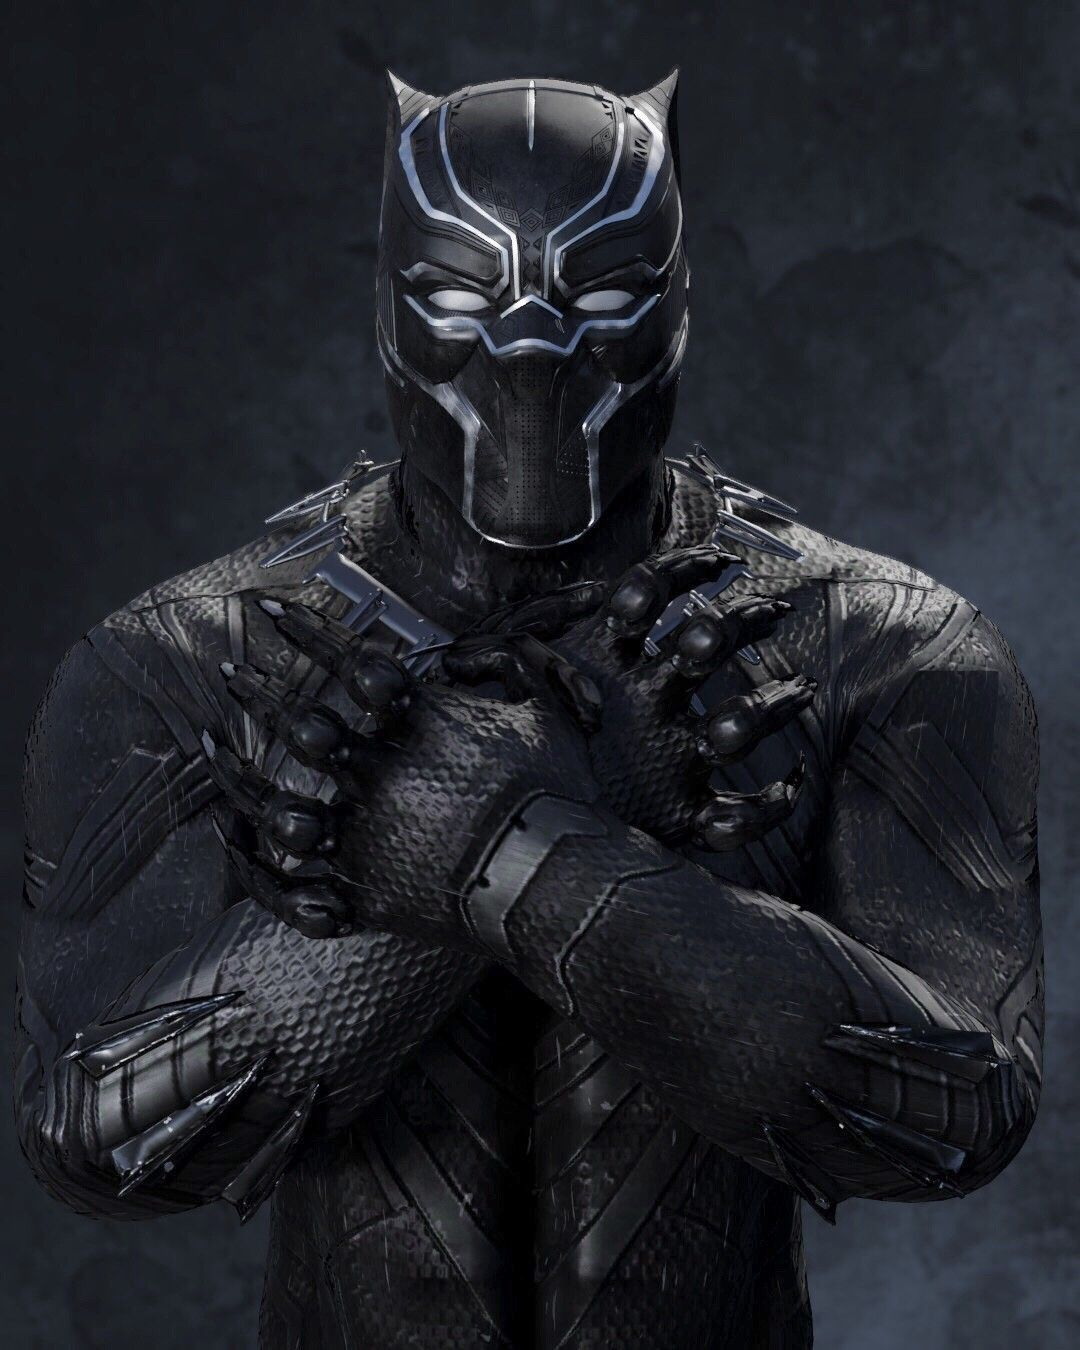 Black Panther - Wakanda Forever!, Saruhan Saral